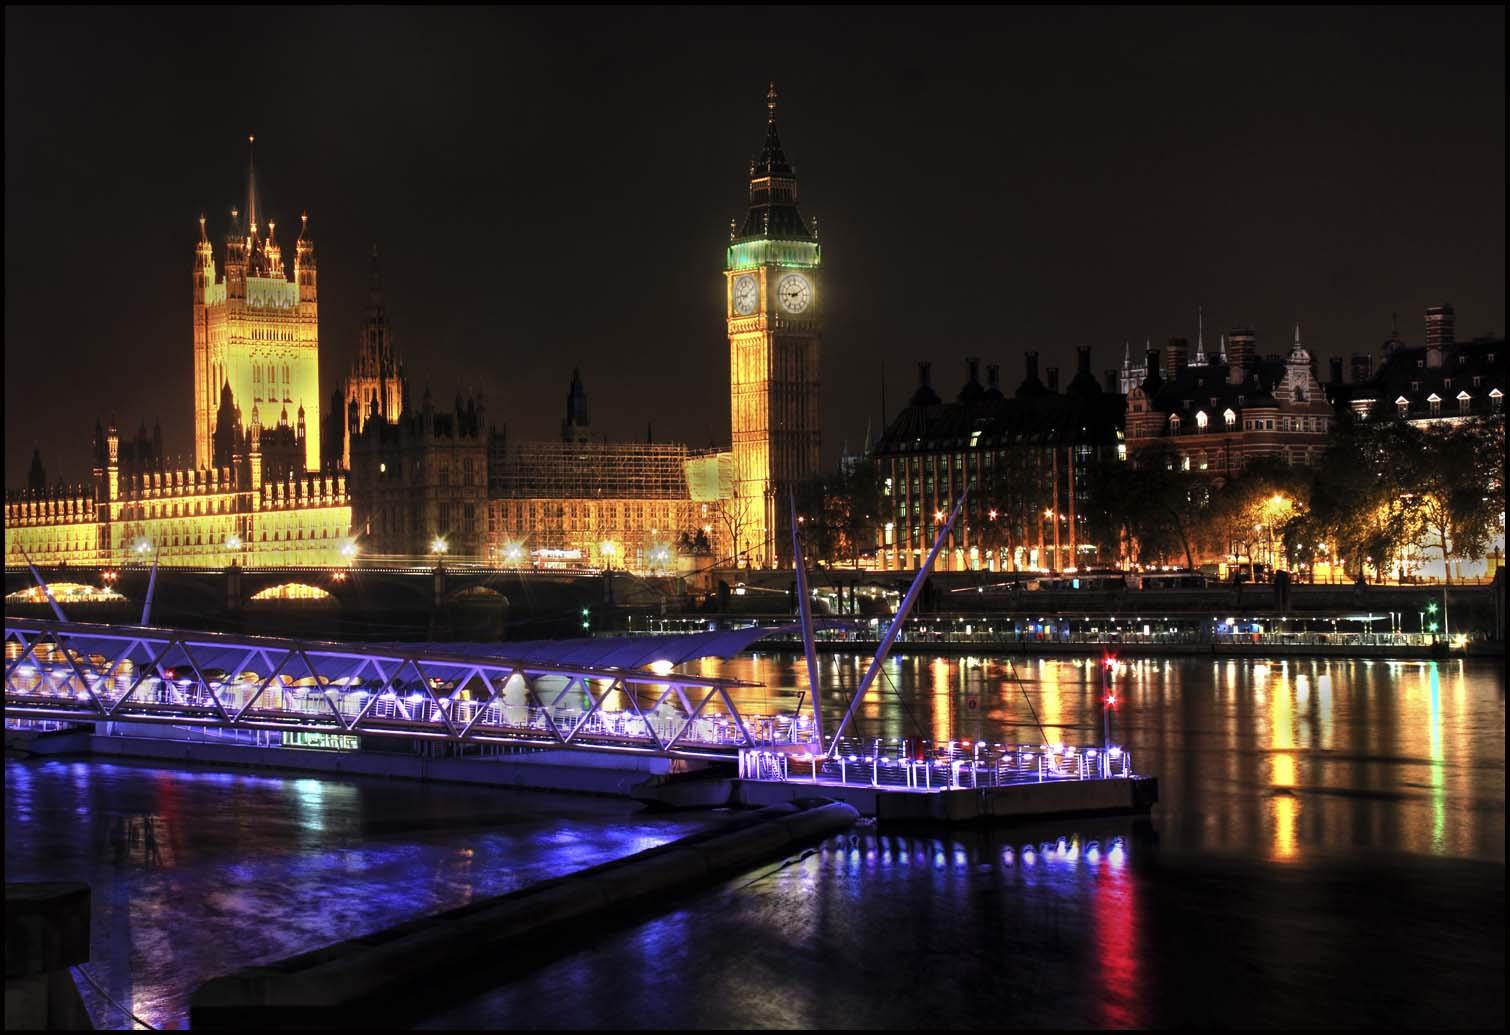 London,night,nightshot,shot,dusk,thames,river,reflection,reflections,houses,parliament,palace,westminster,UK,GB,great,britain,eye,jetty,tripod,hotpix,hotpixuk,TDKTony,Tony,TDK,Smith,embankment,history,historic,365days,photo,photos,photography,photographer,HDR,high dynamic range,tonysmith,hotpics,hotpic,hotpick,hotpicks,building,buildings,built,architecture,#tonysmithhotpix